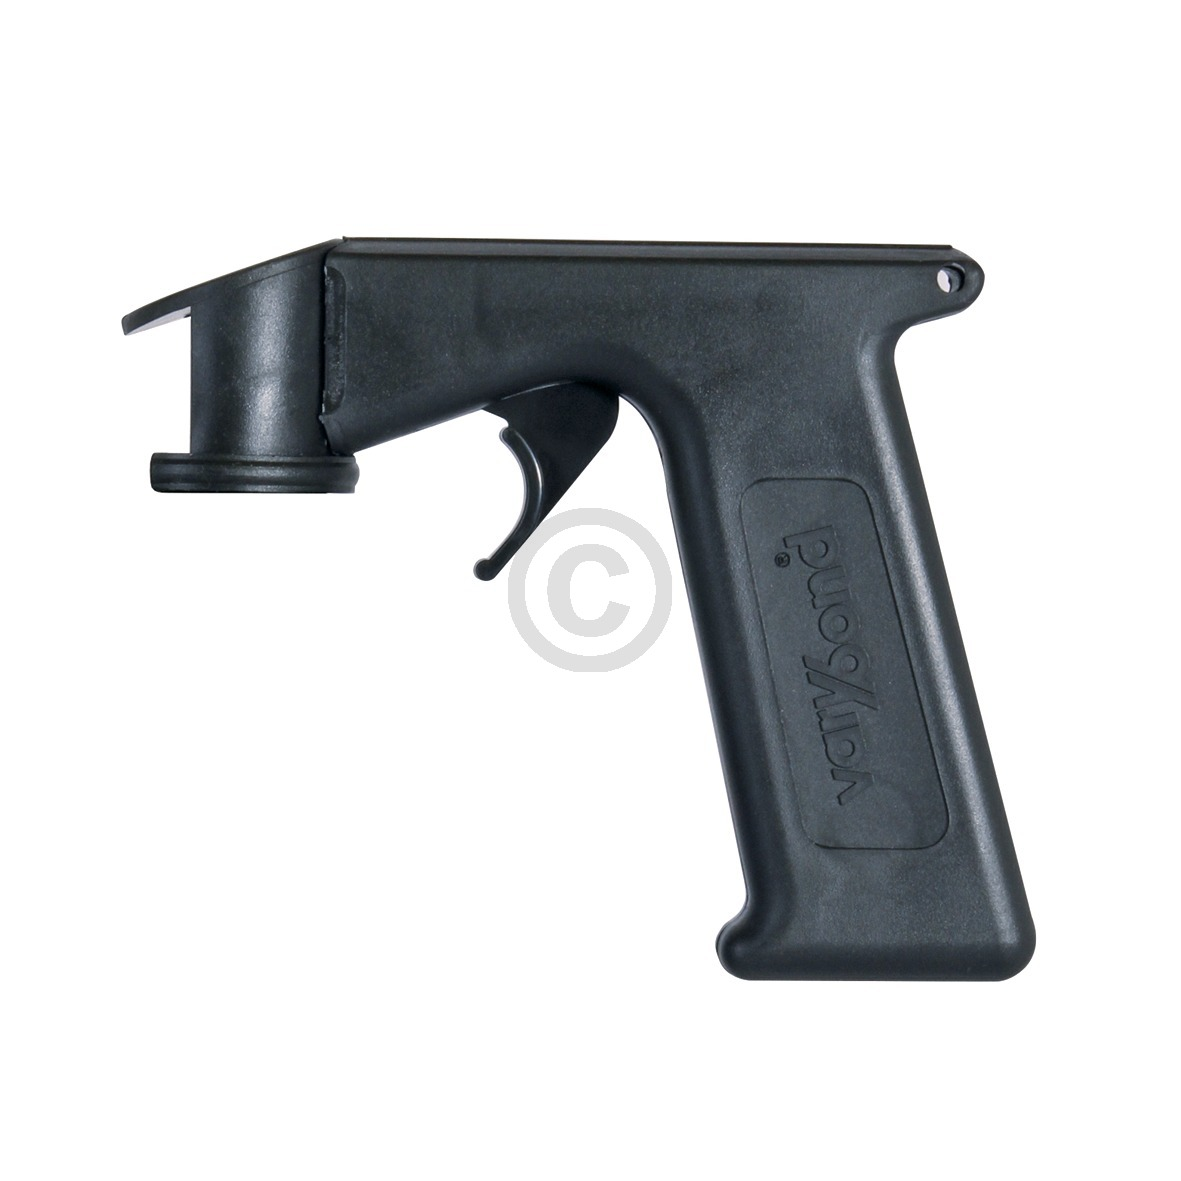 Spraydosen-Pistolenaufsatz